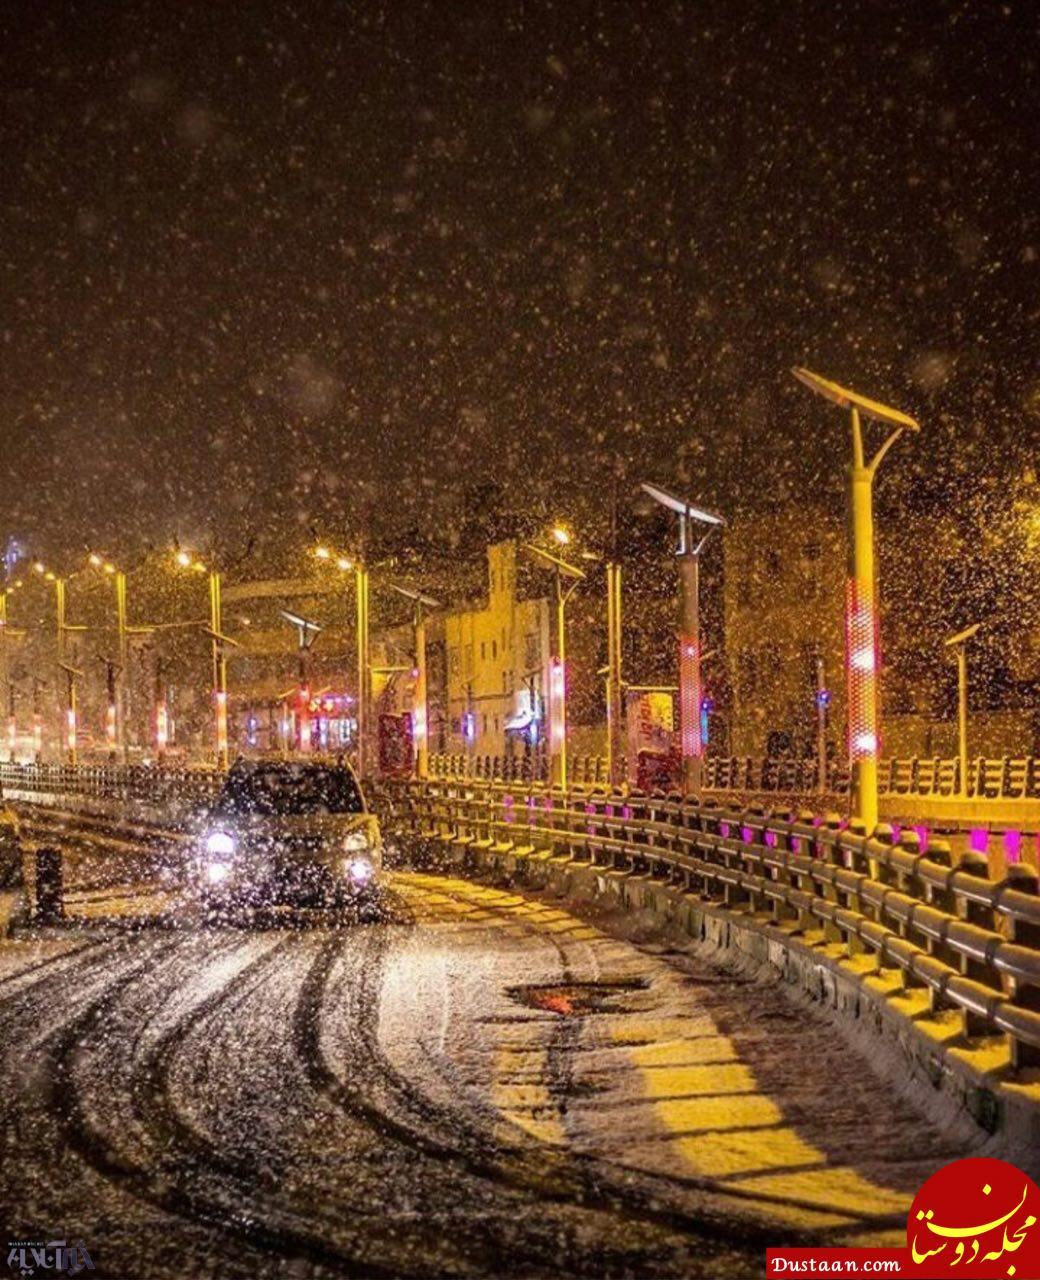 www.dustaan.com بارش اولین برف پاییزی در ارومیه +تصاویر